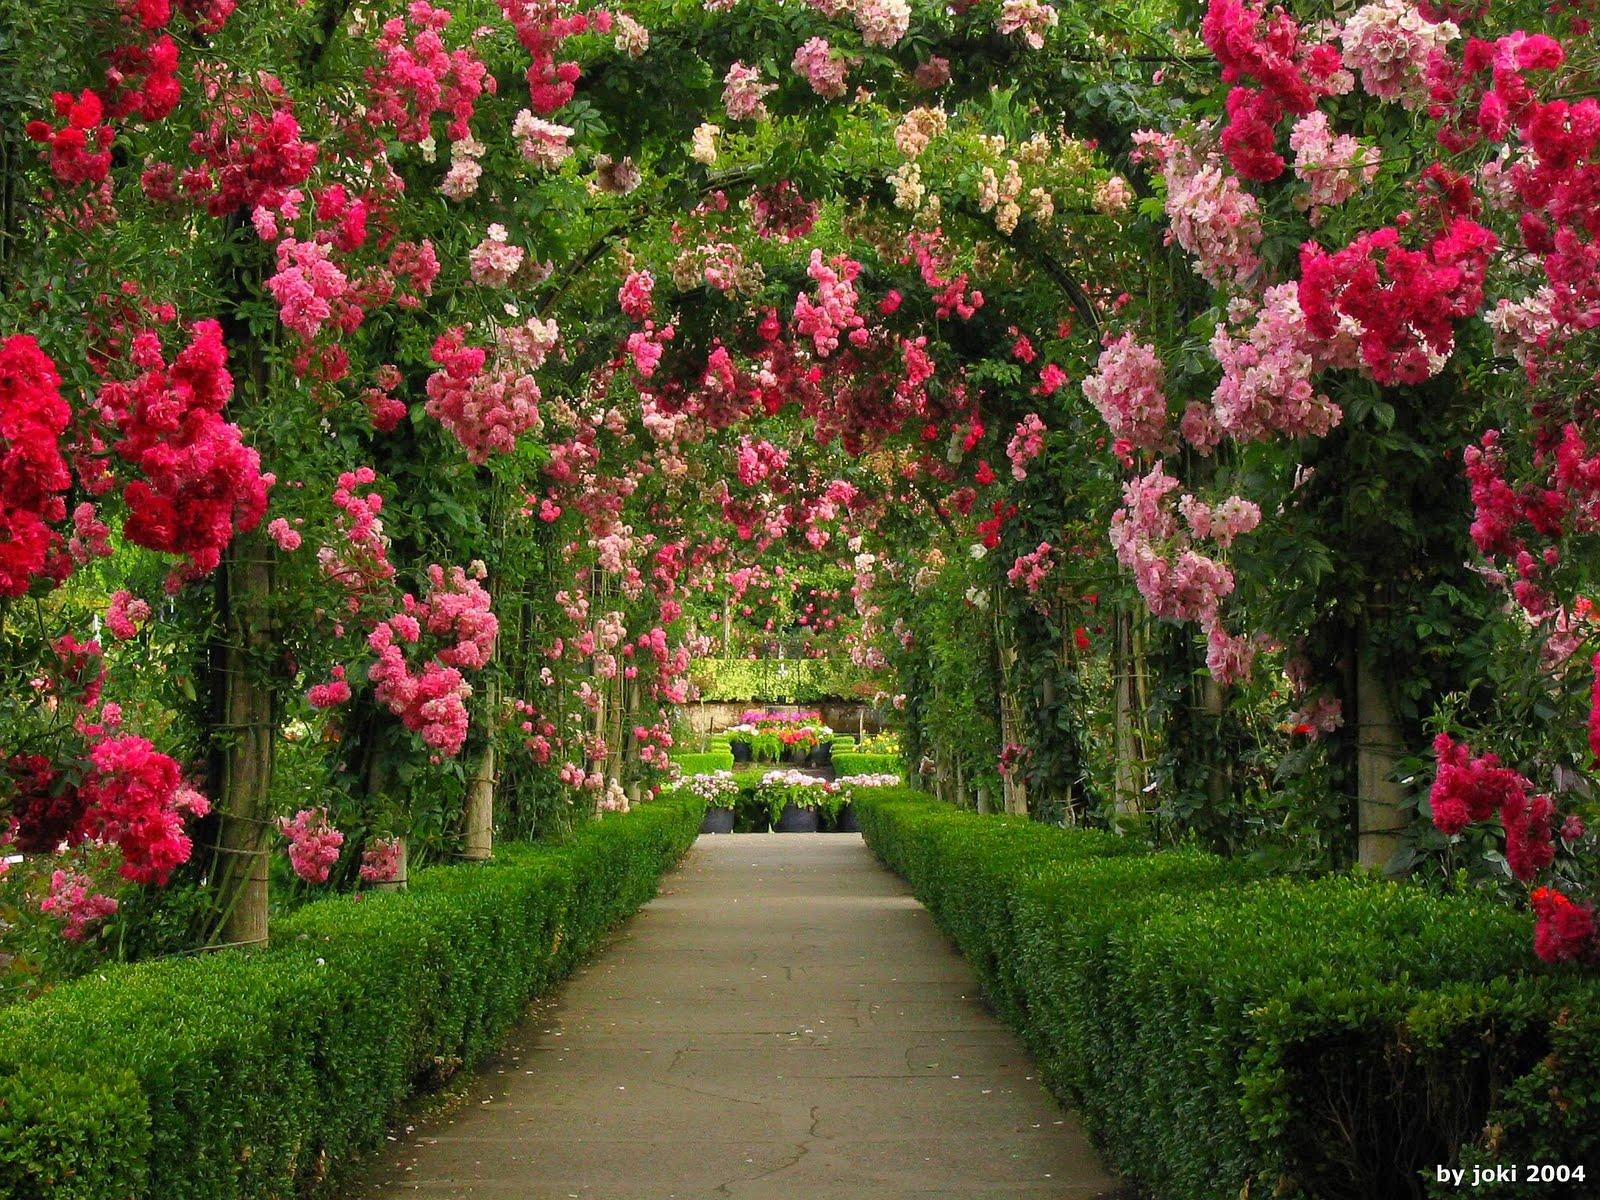 Free download Morada dos Gifs LINDOS GIFS DE ROSAS 3 [1600x1200] for your  Desktop, Mobile & Tablet   Explore 49+ Preacher of Roses on Wallpaper    Roses Wallpaper Desktop, Free Rose Wallpaper